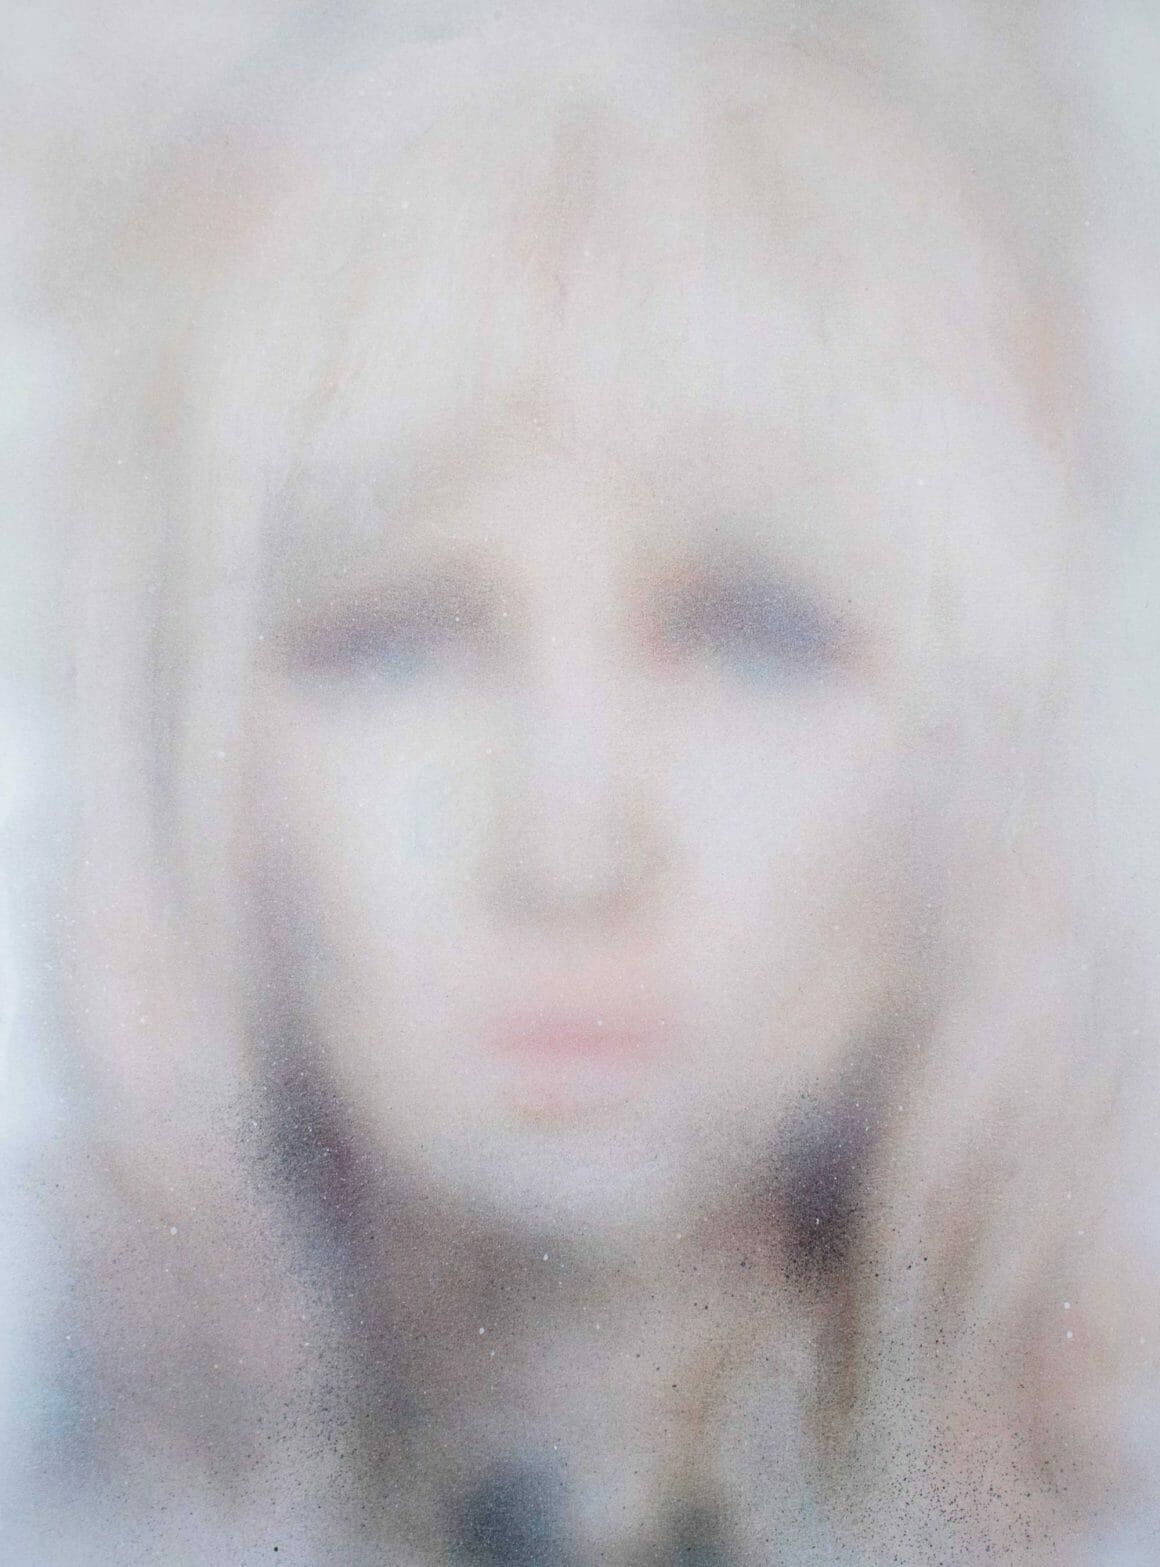 Portrait d'une femme blonde flou illustration Eliana Marinari